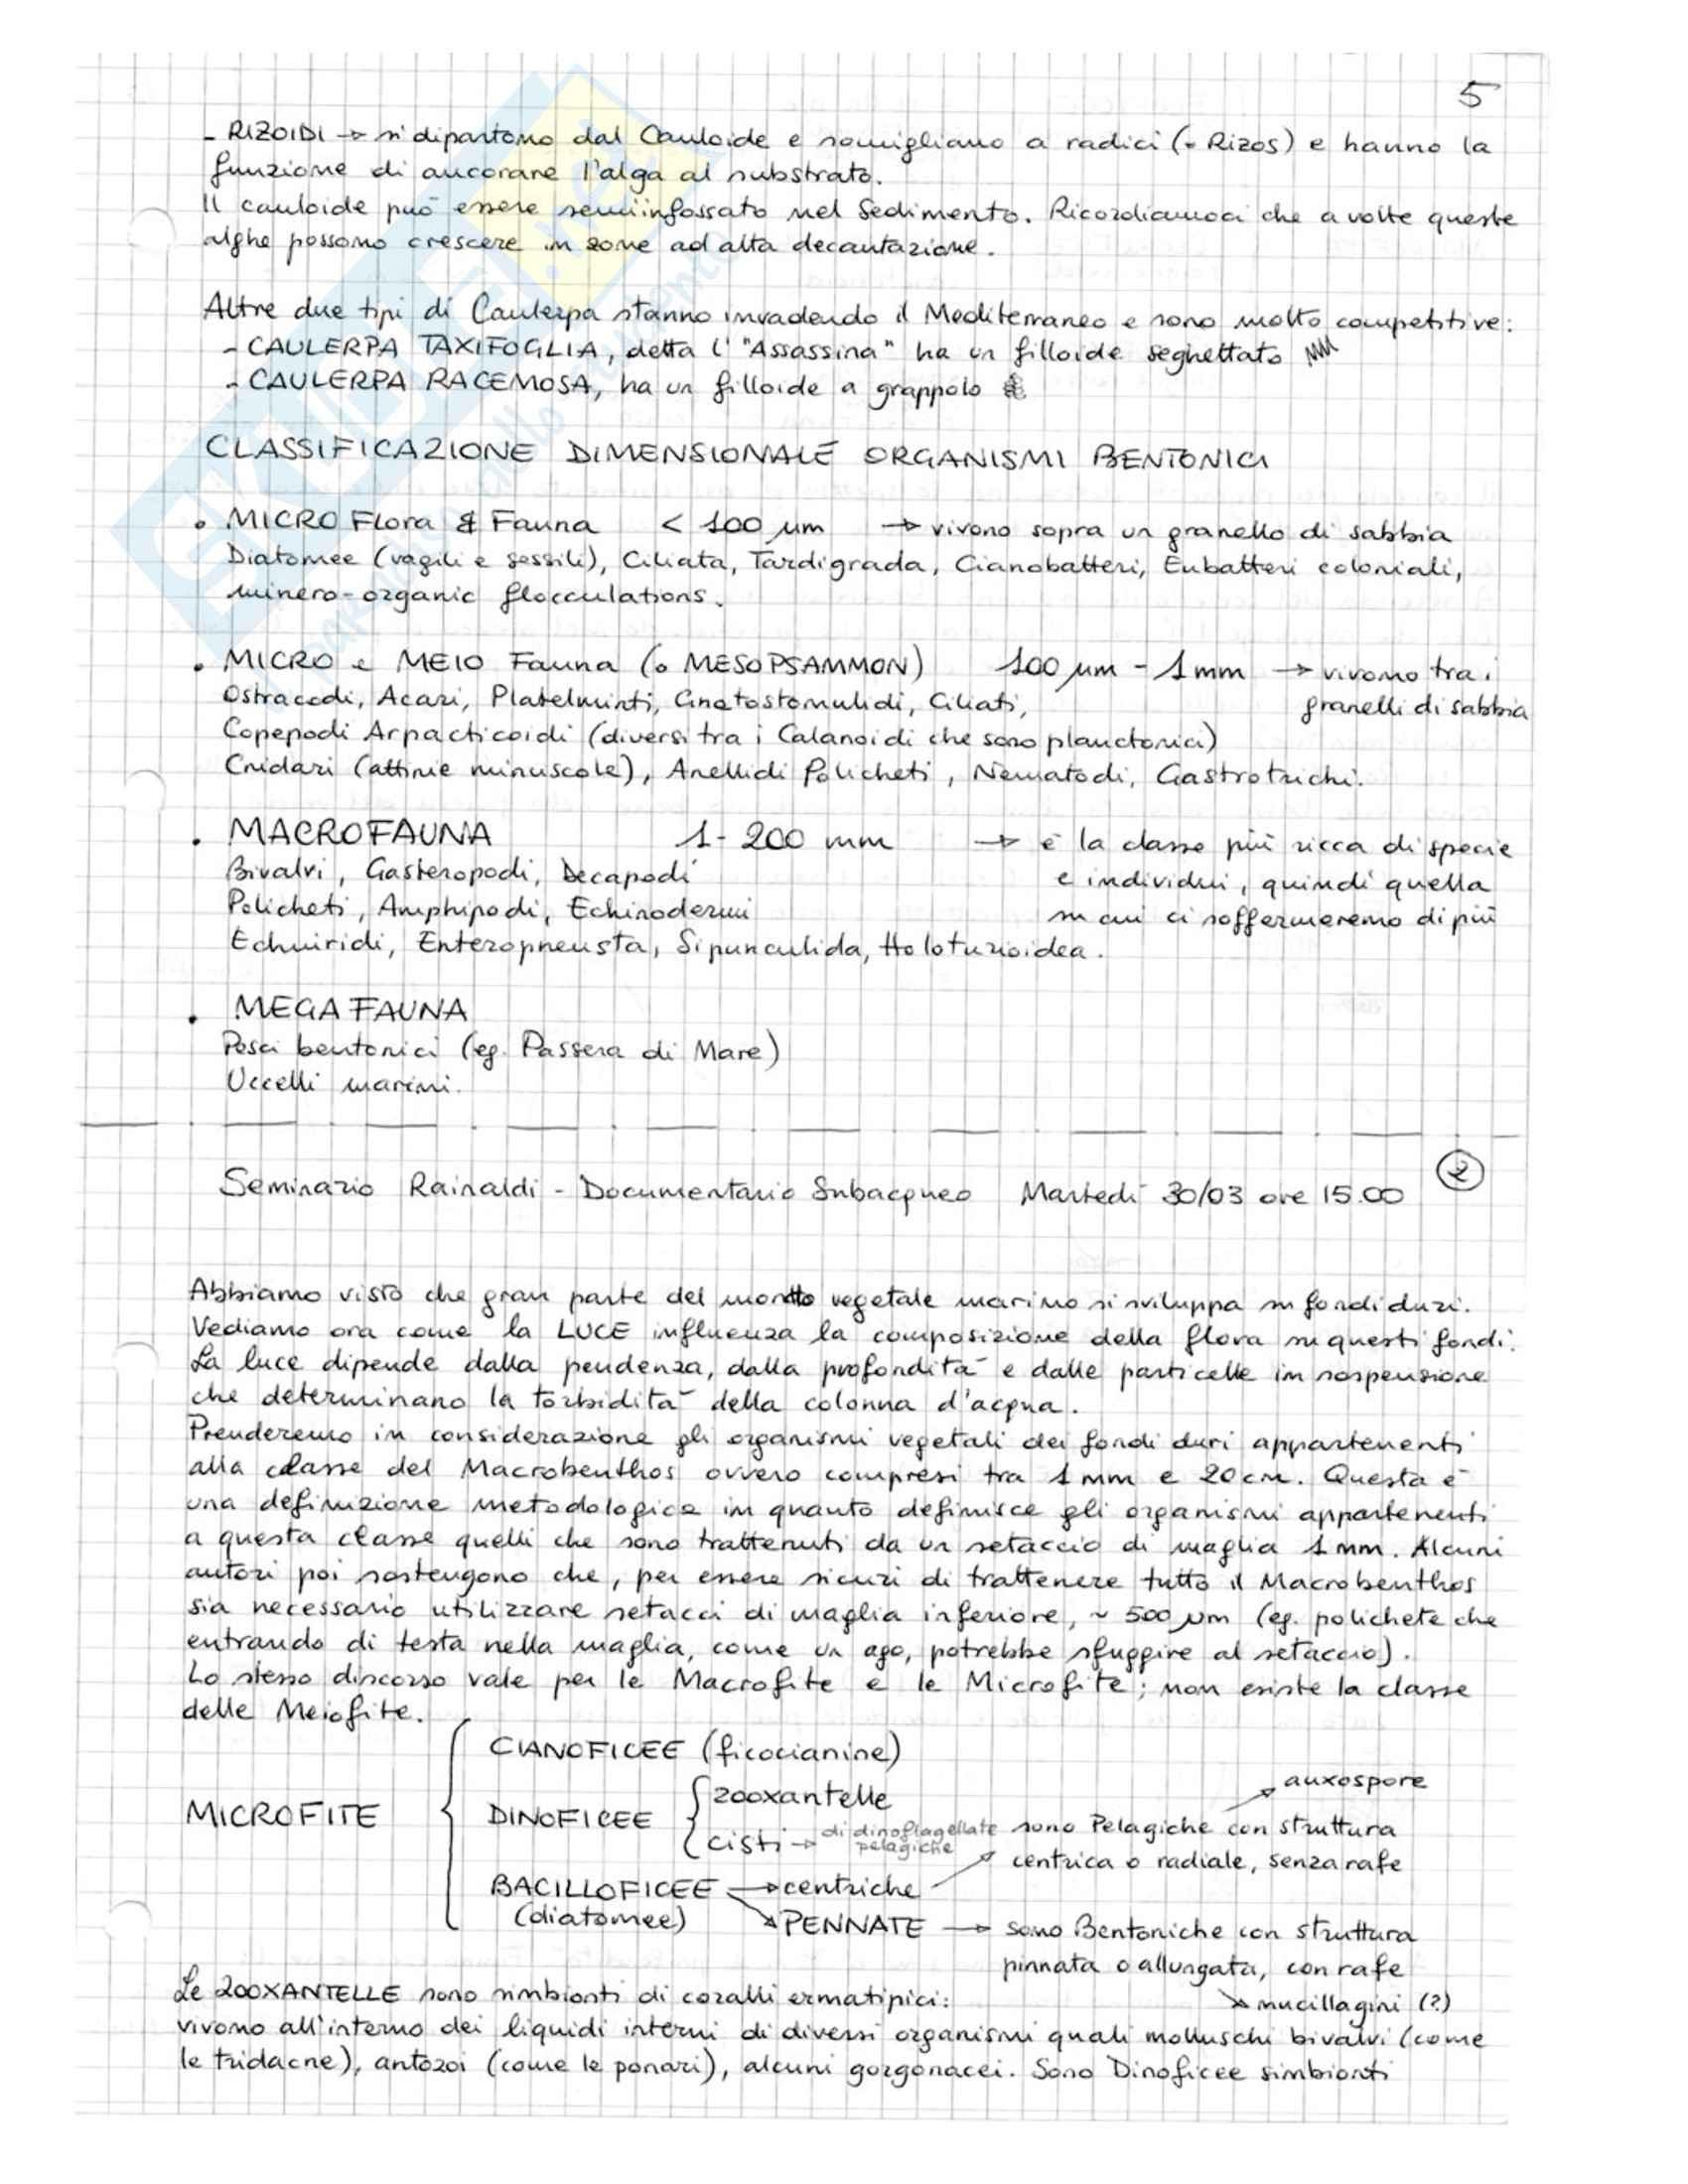 Ecologia del Benthos - Appunti Pag. 6